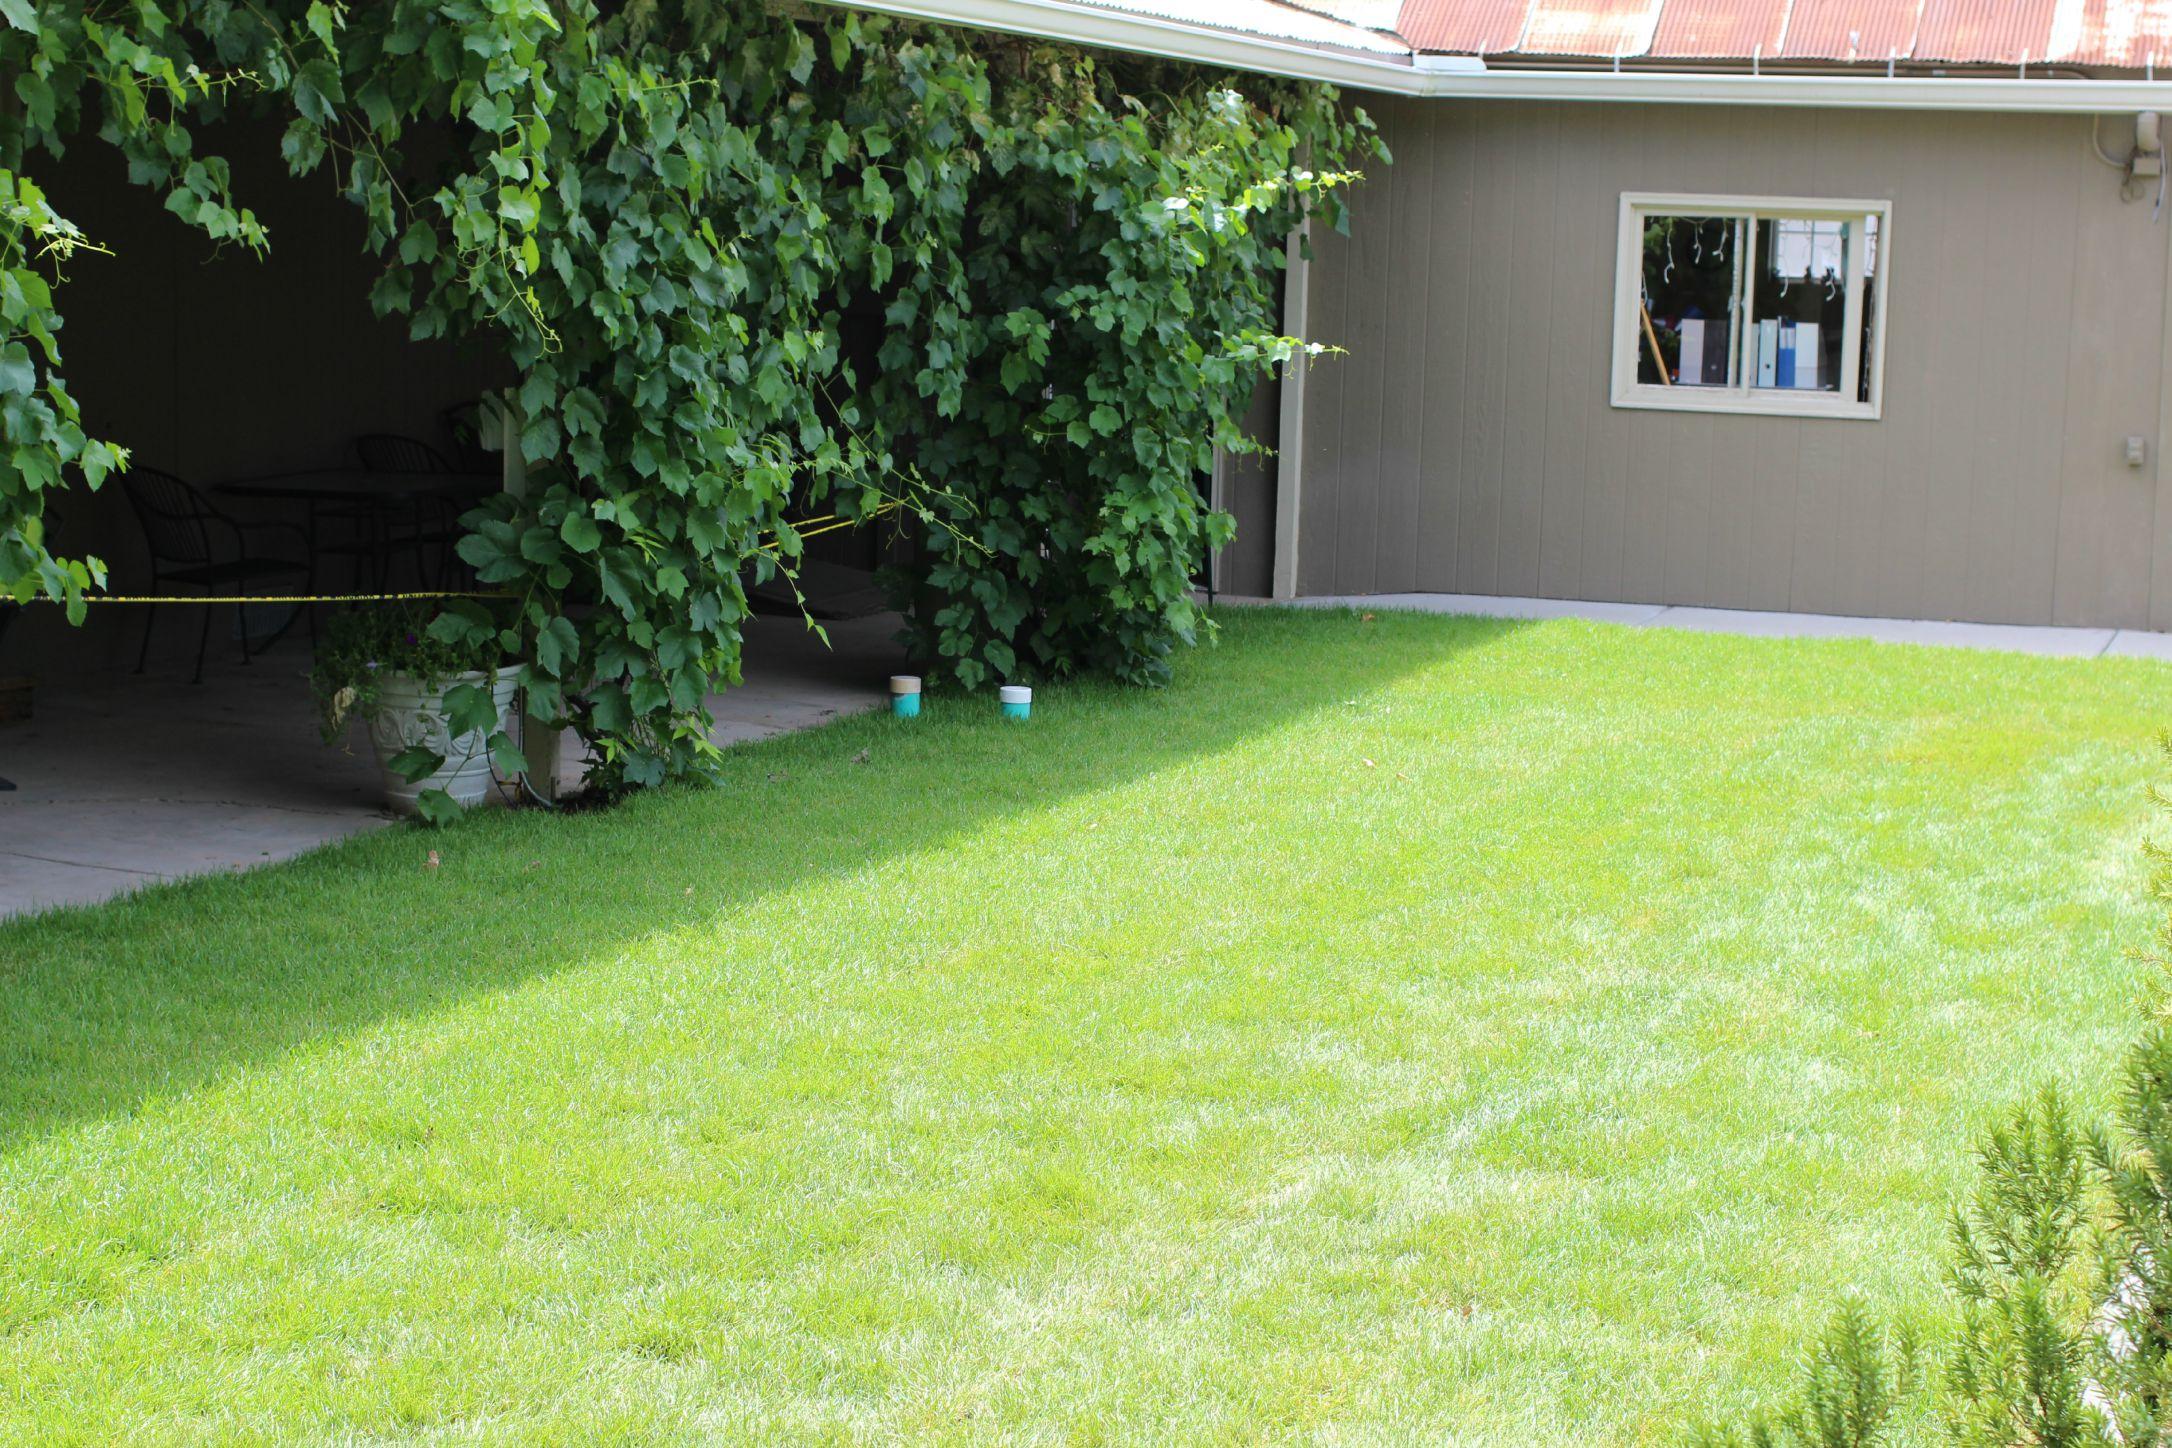 -Palisade Branch landscaping (2) 7-24-15